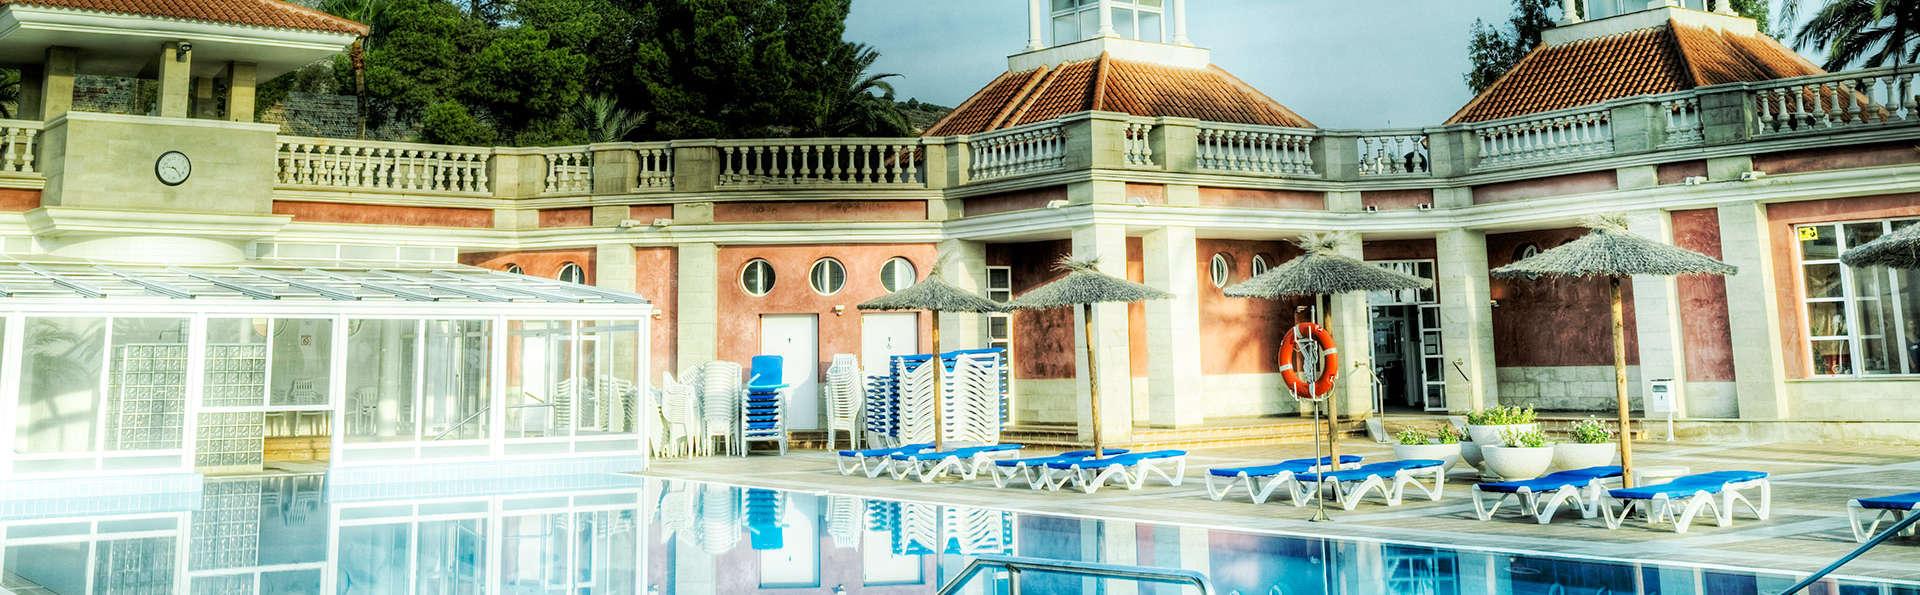 Balneario Leana - EDIT_pool2.jpg